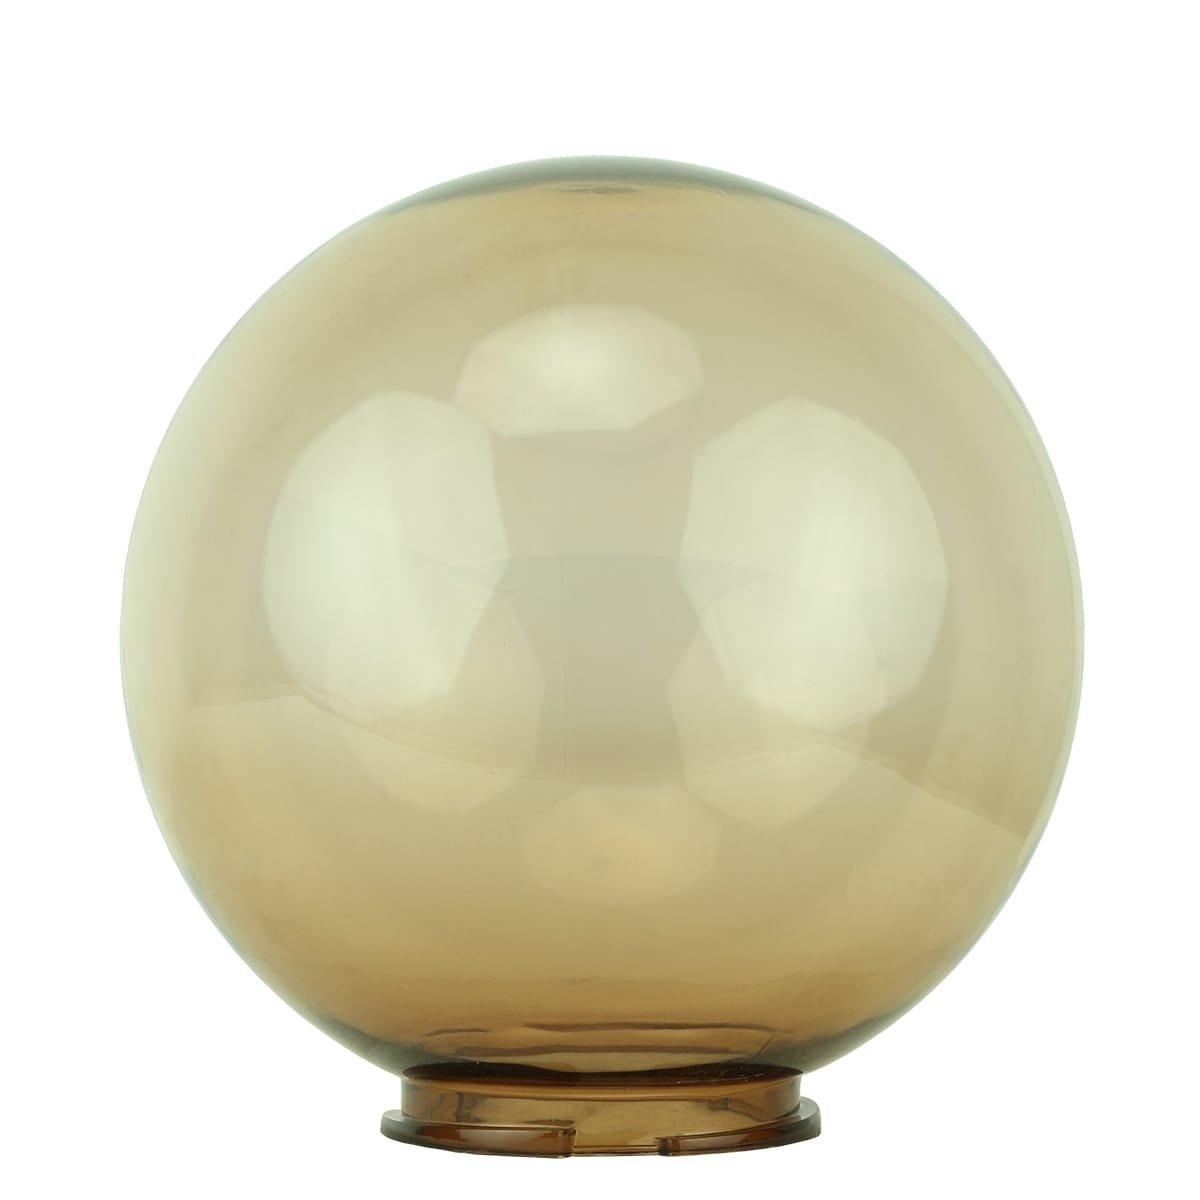 Buitenverlichting Onderdelen Losse tuinbol lamp rooklglas - Ø 30 cm